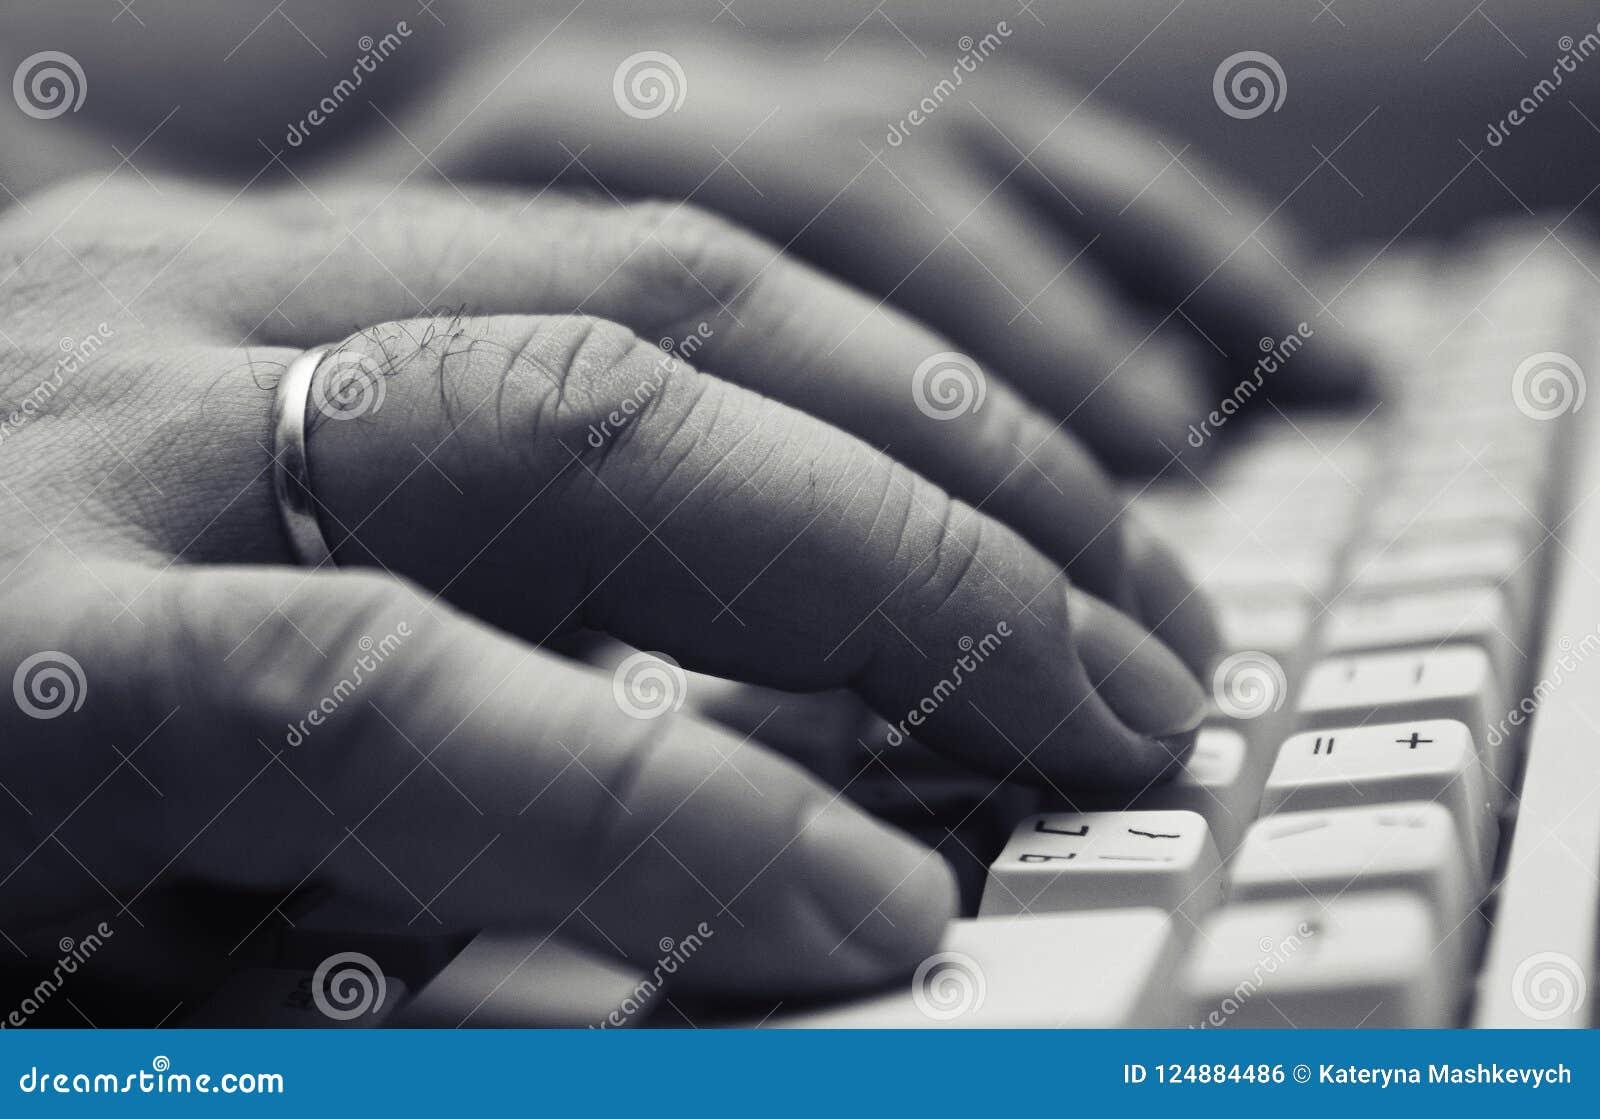 Closeup of man hands on computer keyboard